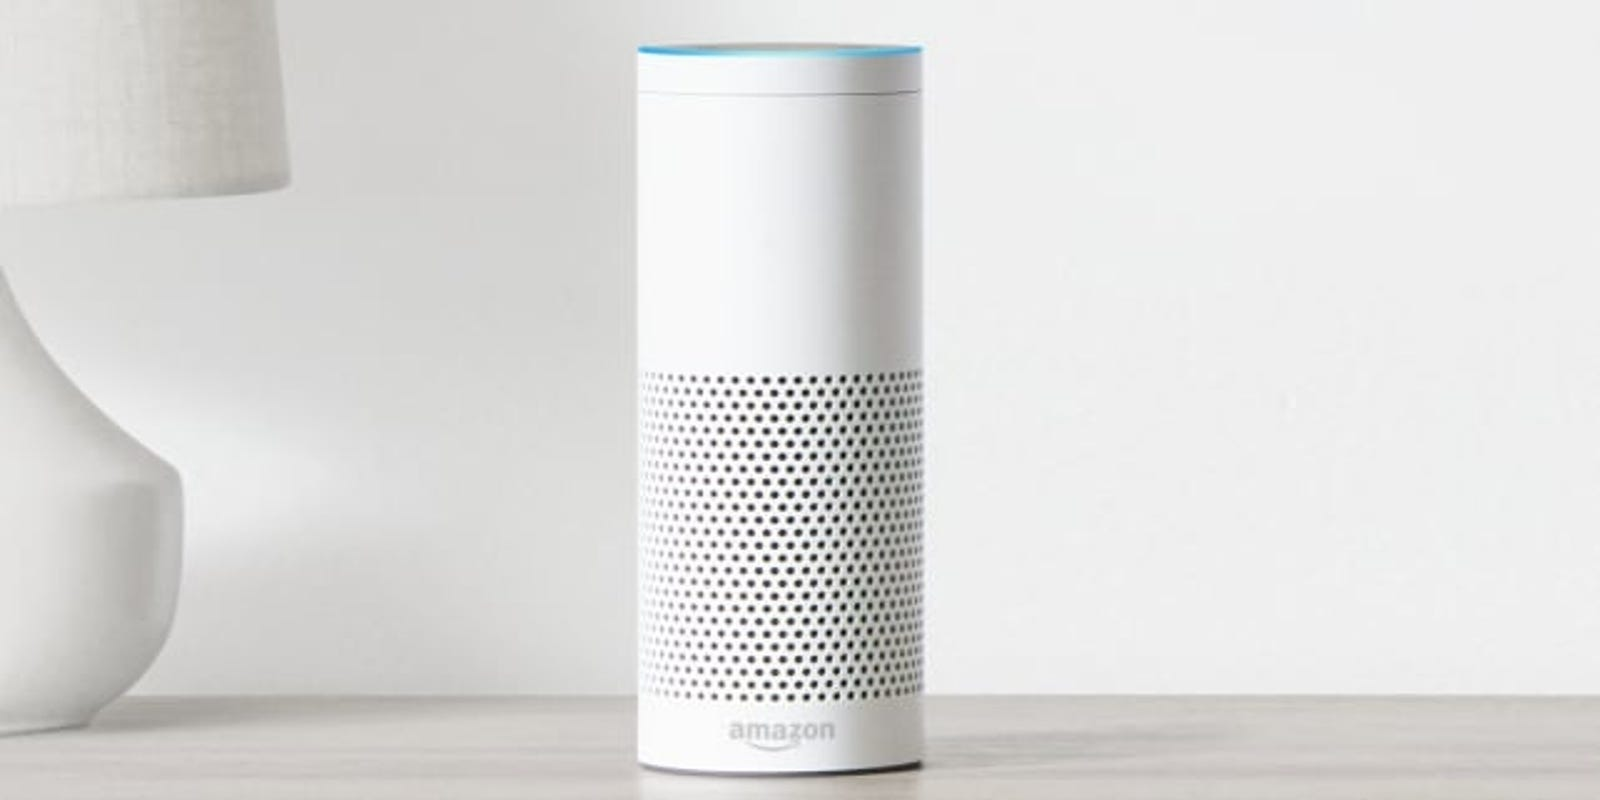 Amazon Alexa: 21 clever commands for Amazon Echo